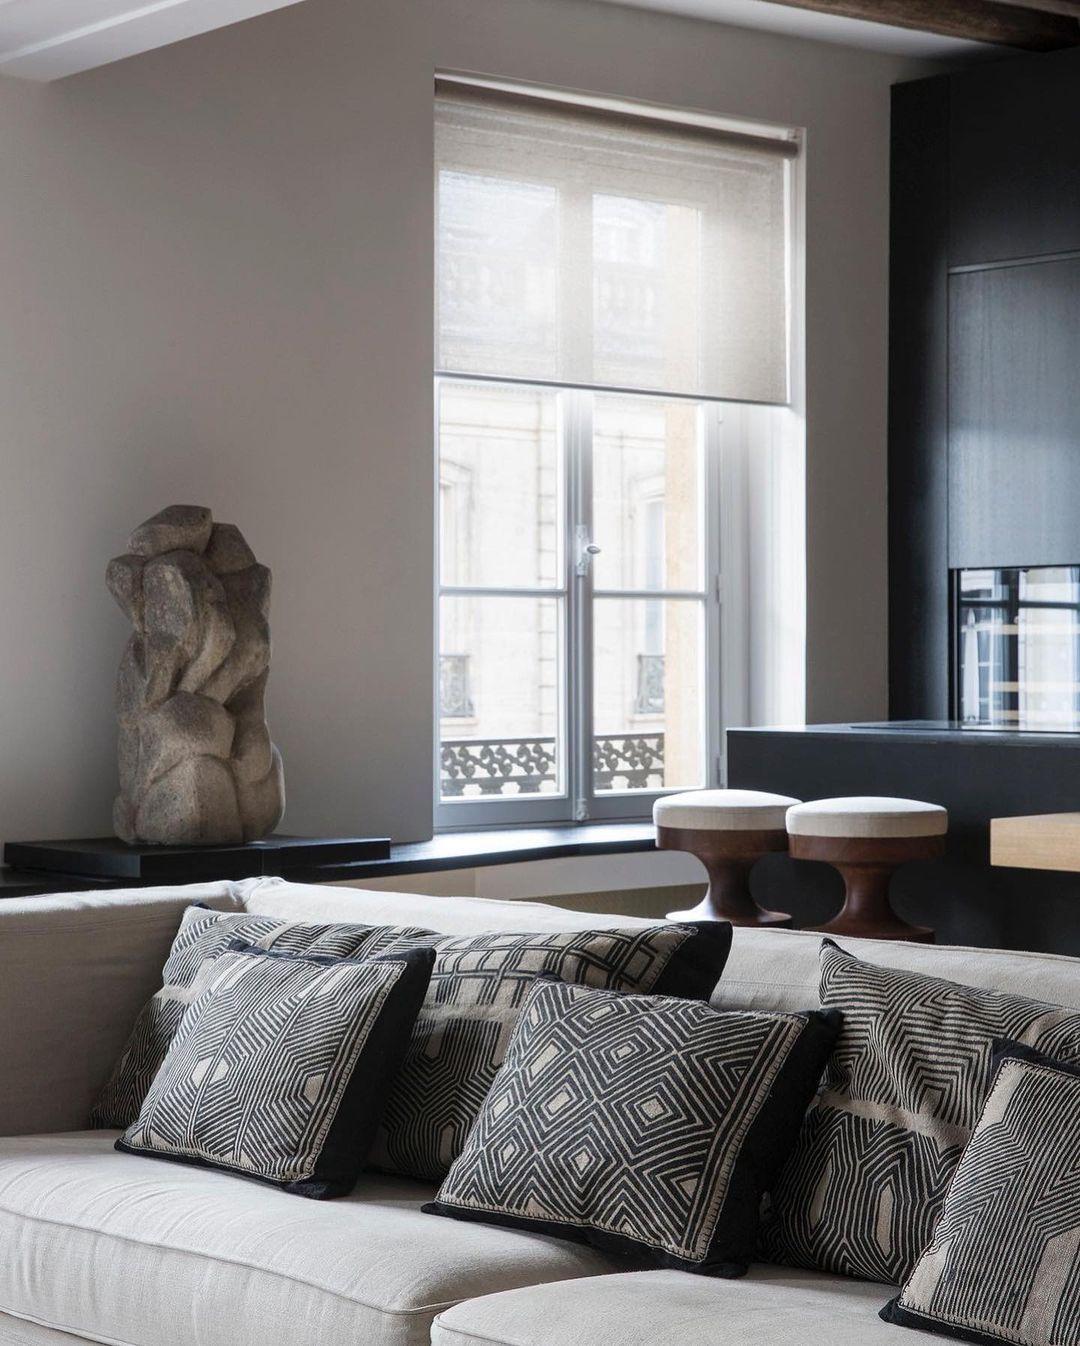 "Kenneth Ling on Instagram: ""Parisian apartment designed by @studio.arthurcasas . . . . Via: @leibal @studio.arthurcasas . . . . #arthurcasas #timeless #frenchmodernism…"""